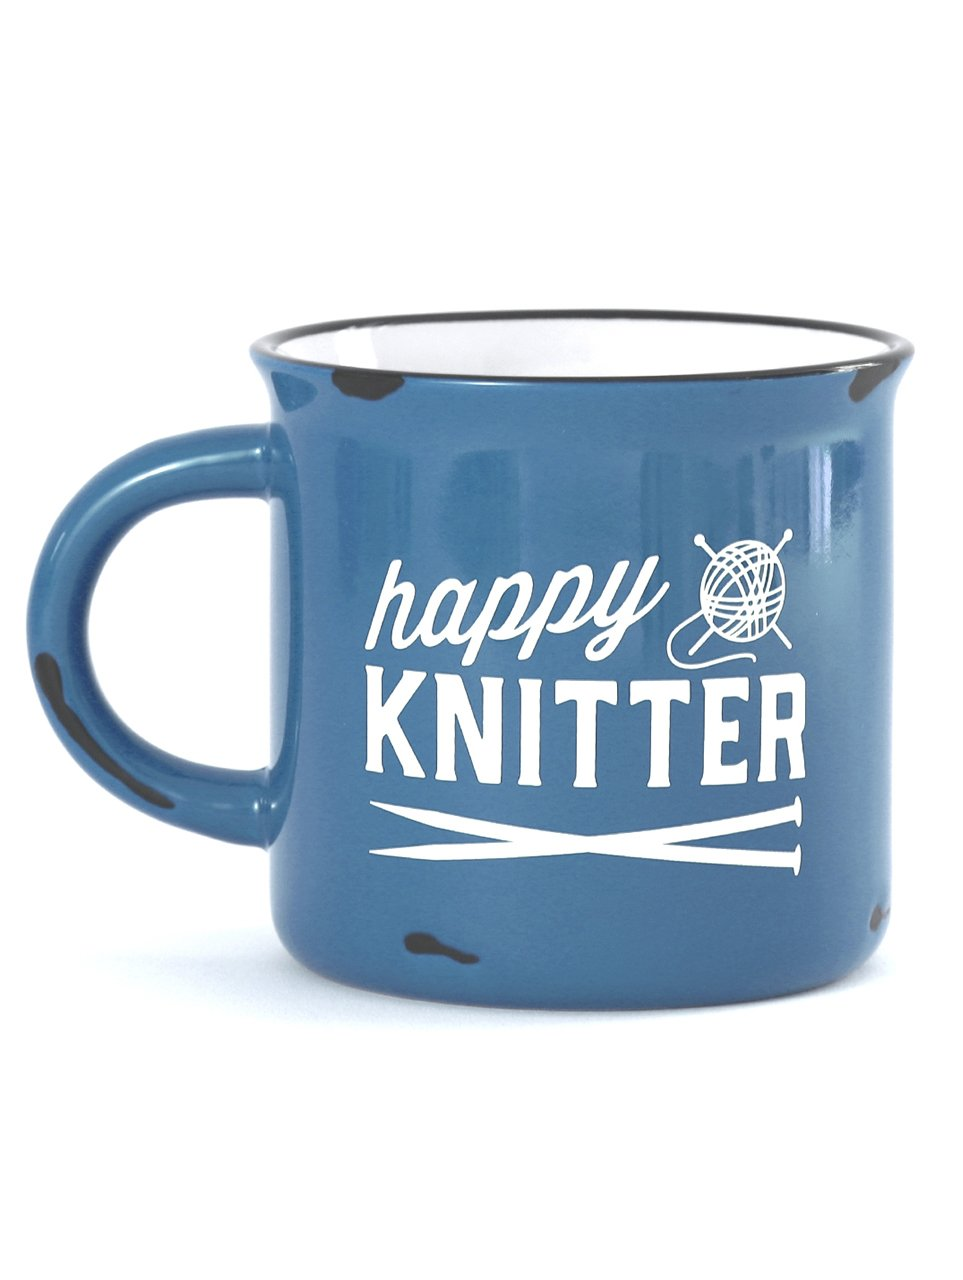 Happy Knitter Camp Mug